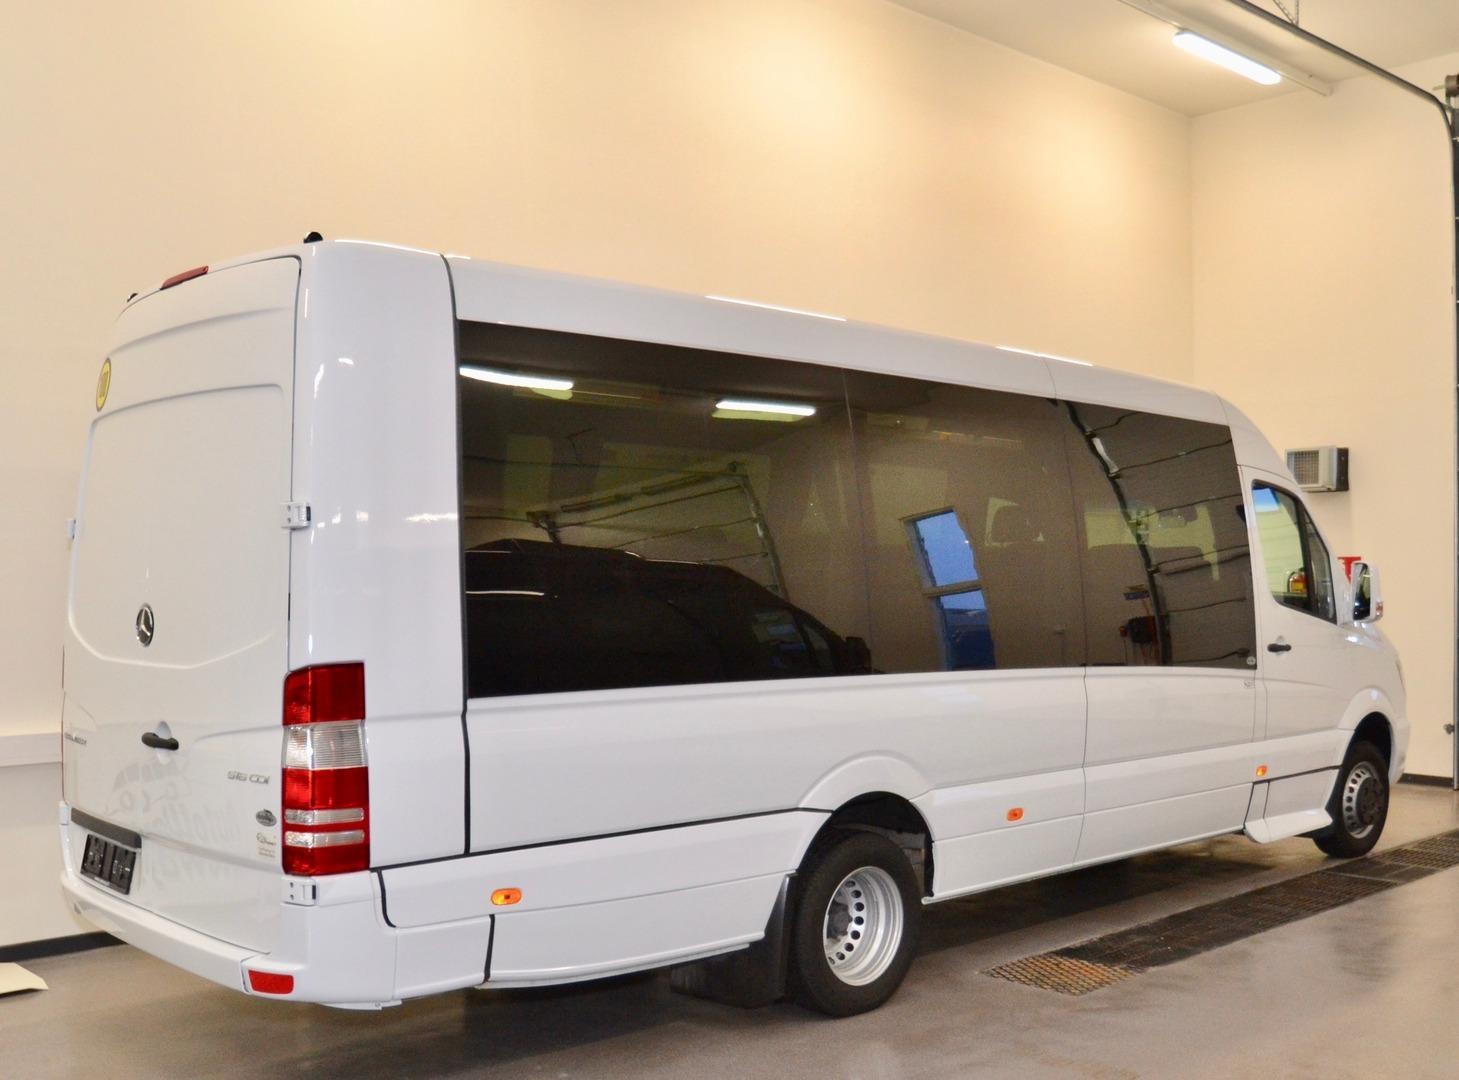 MERCEDES-BENZ Sprinter, 516 CDI Automet Koulu